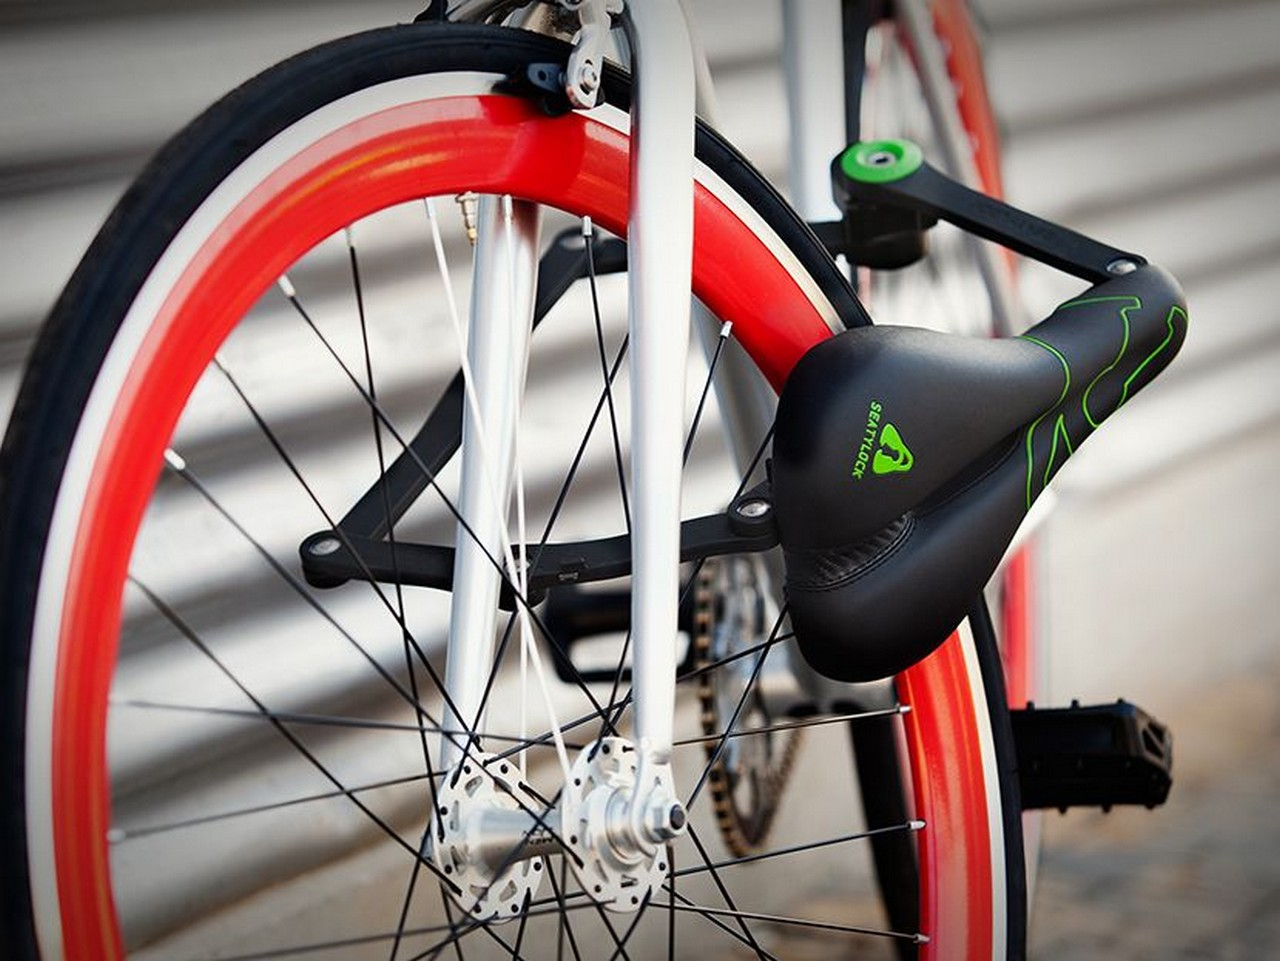 Asiento de bicicleta que sirve como candado